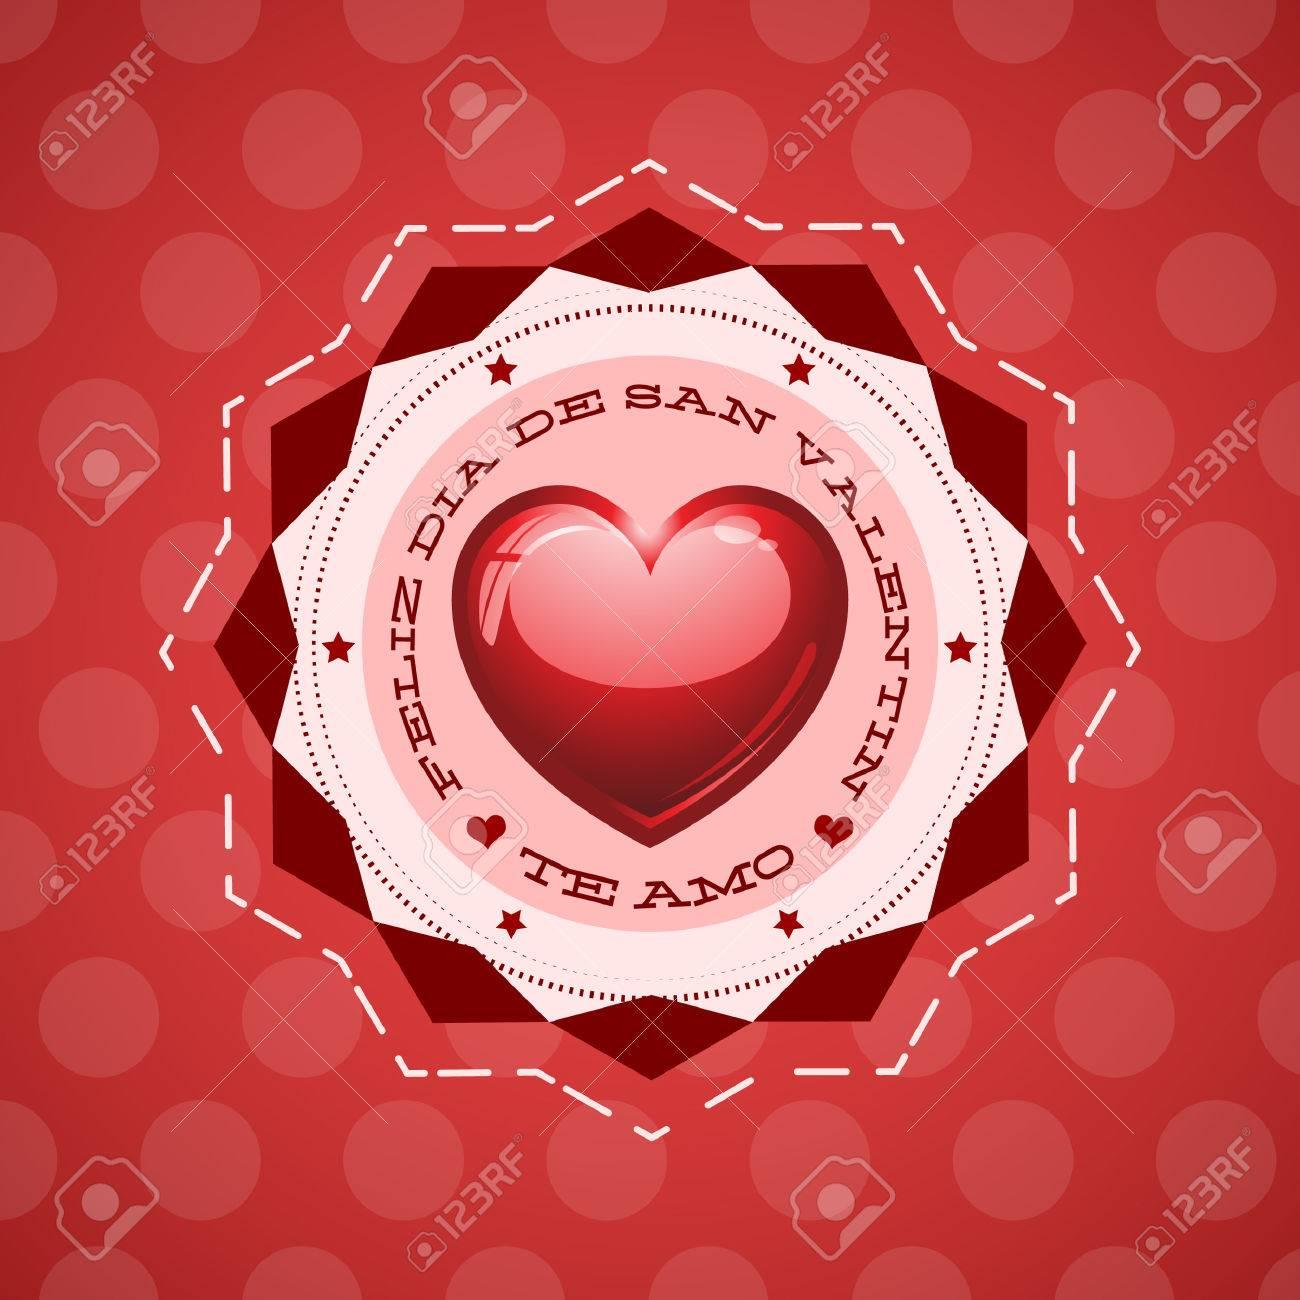 Feliz Dia De San Valentin   Happy Valentines Day Spanish Text   Greeting  Card   Vector